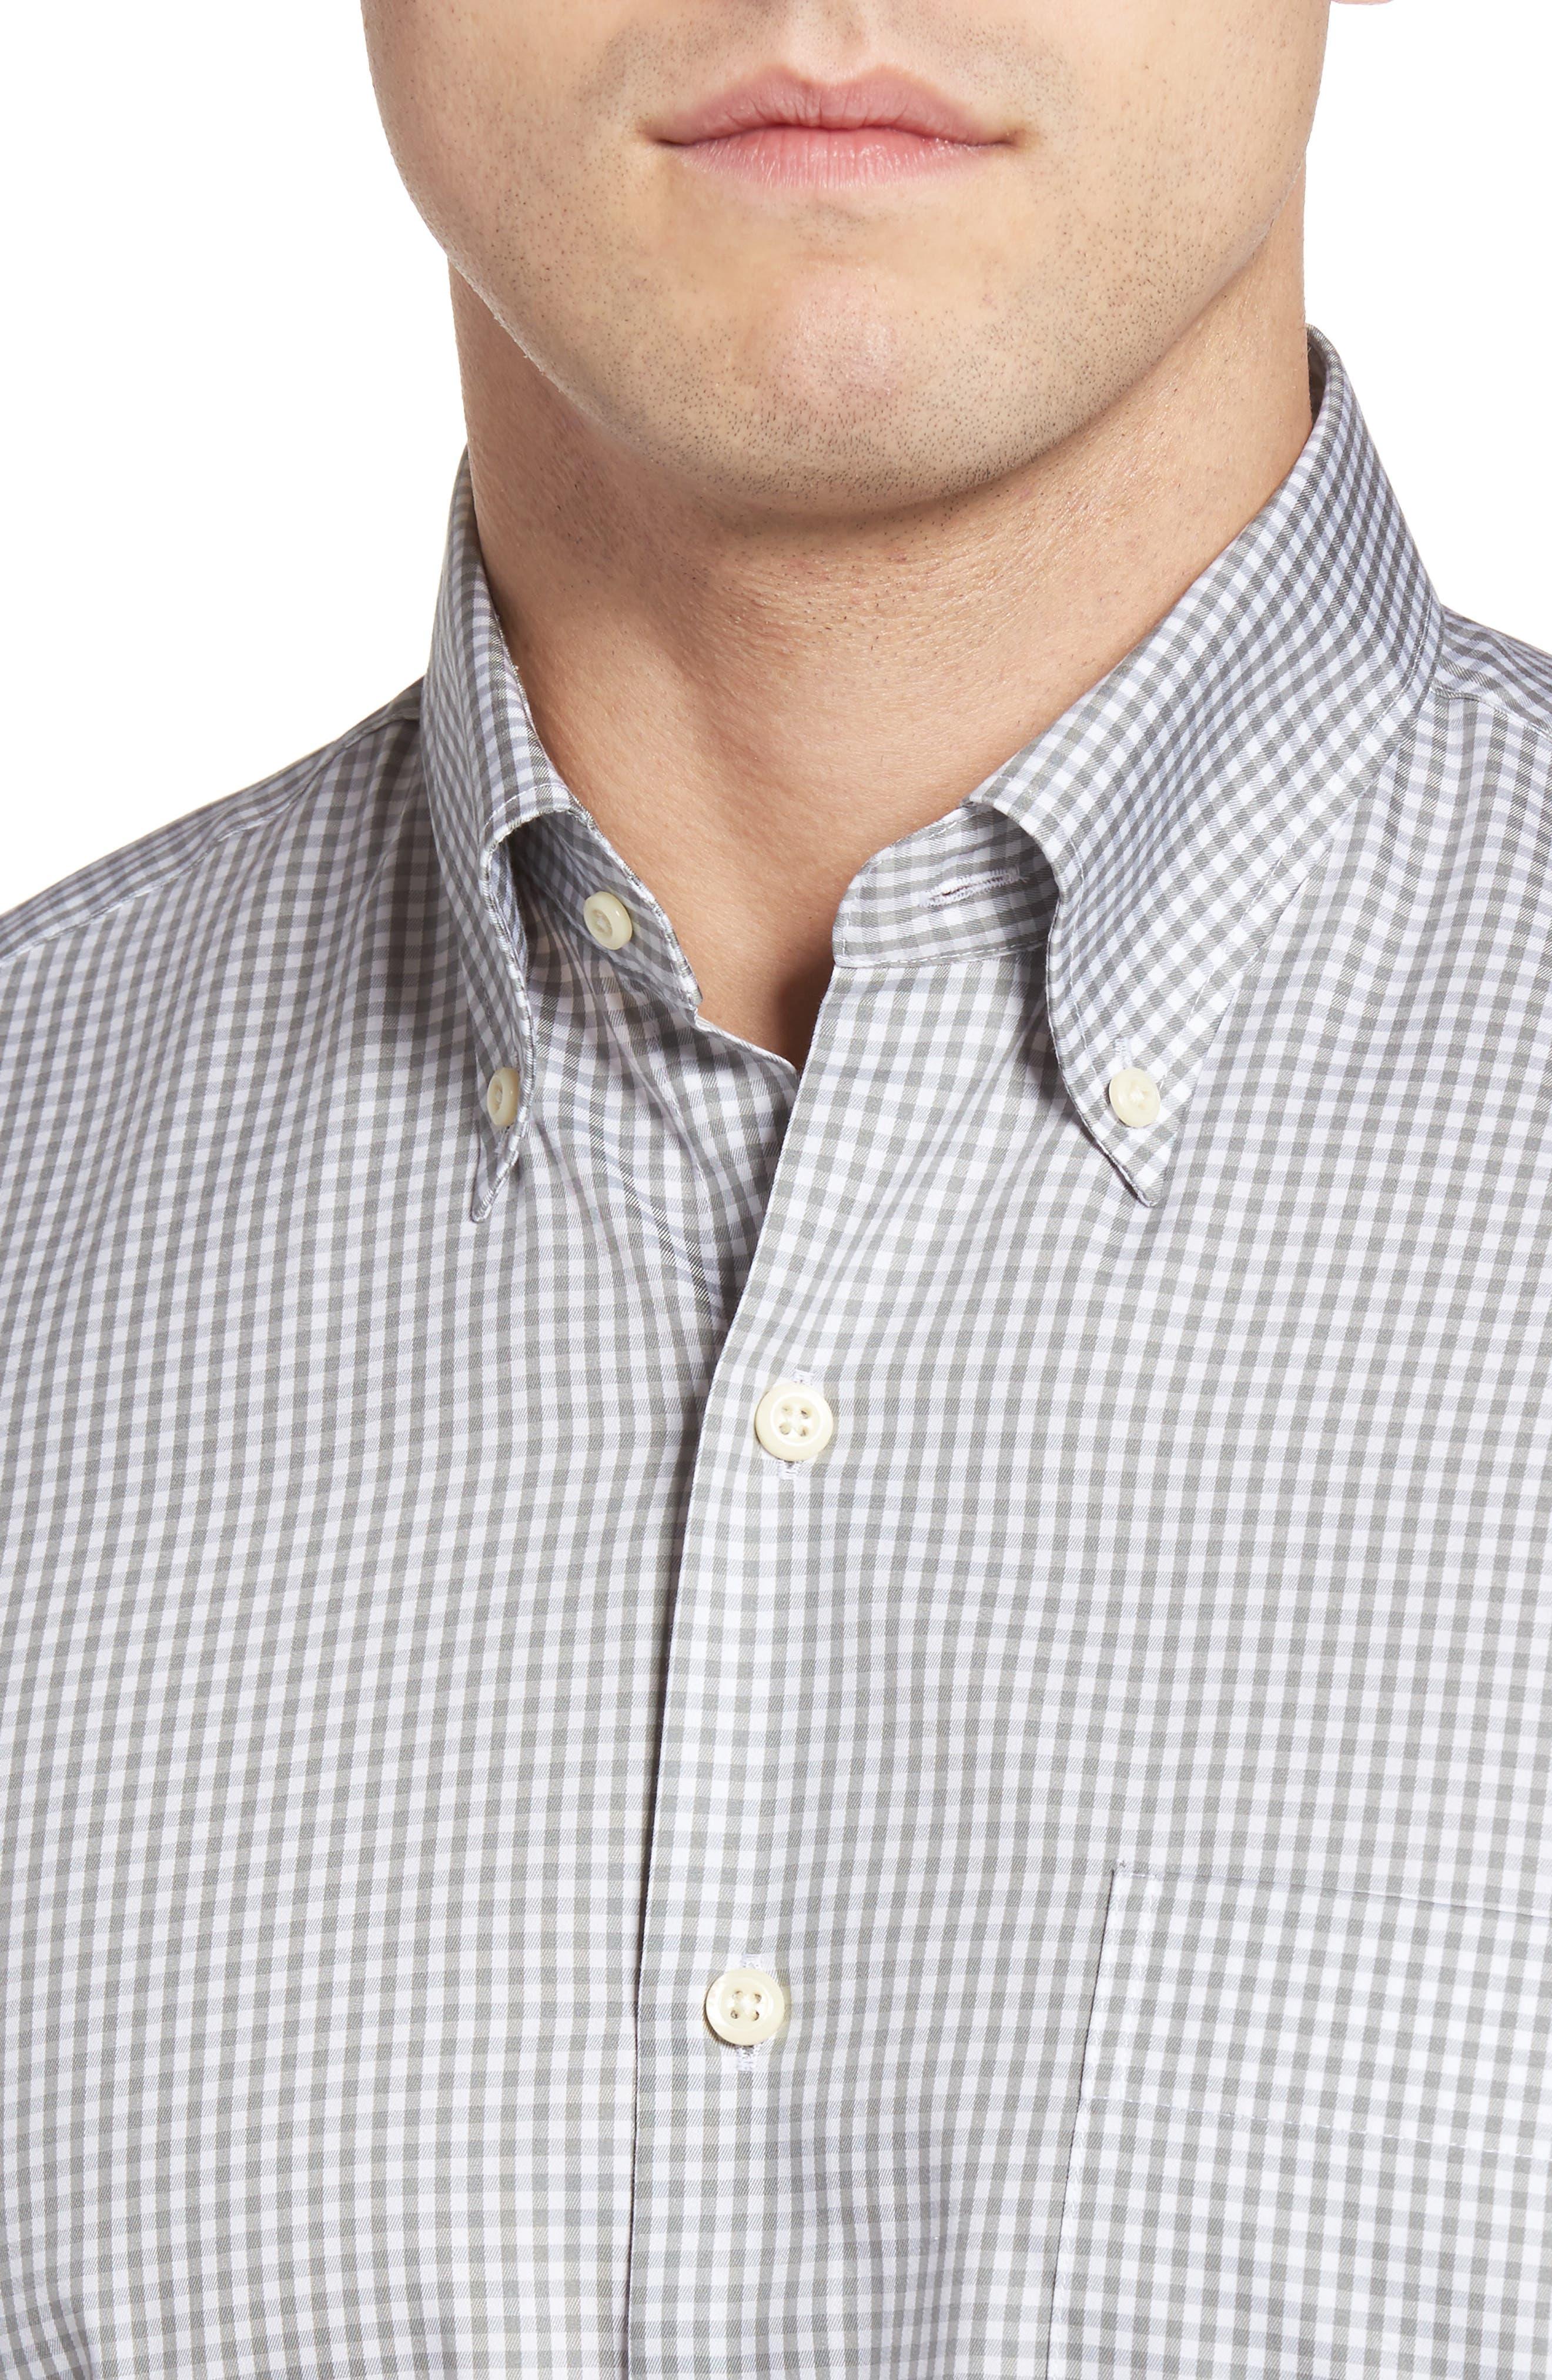 Crown Soft Gingham Regular Fit Sport Shirt,                             Alternate thumbnail 4, color,                             Light Grey